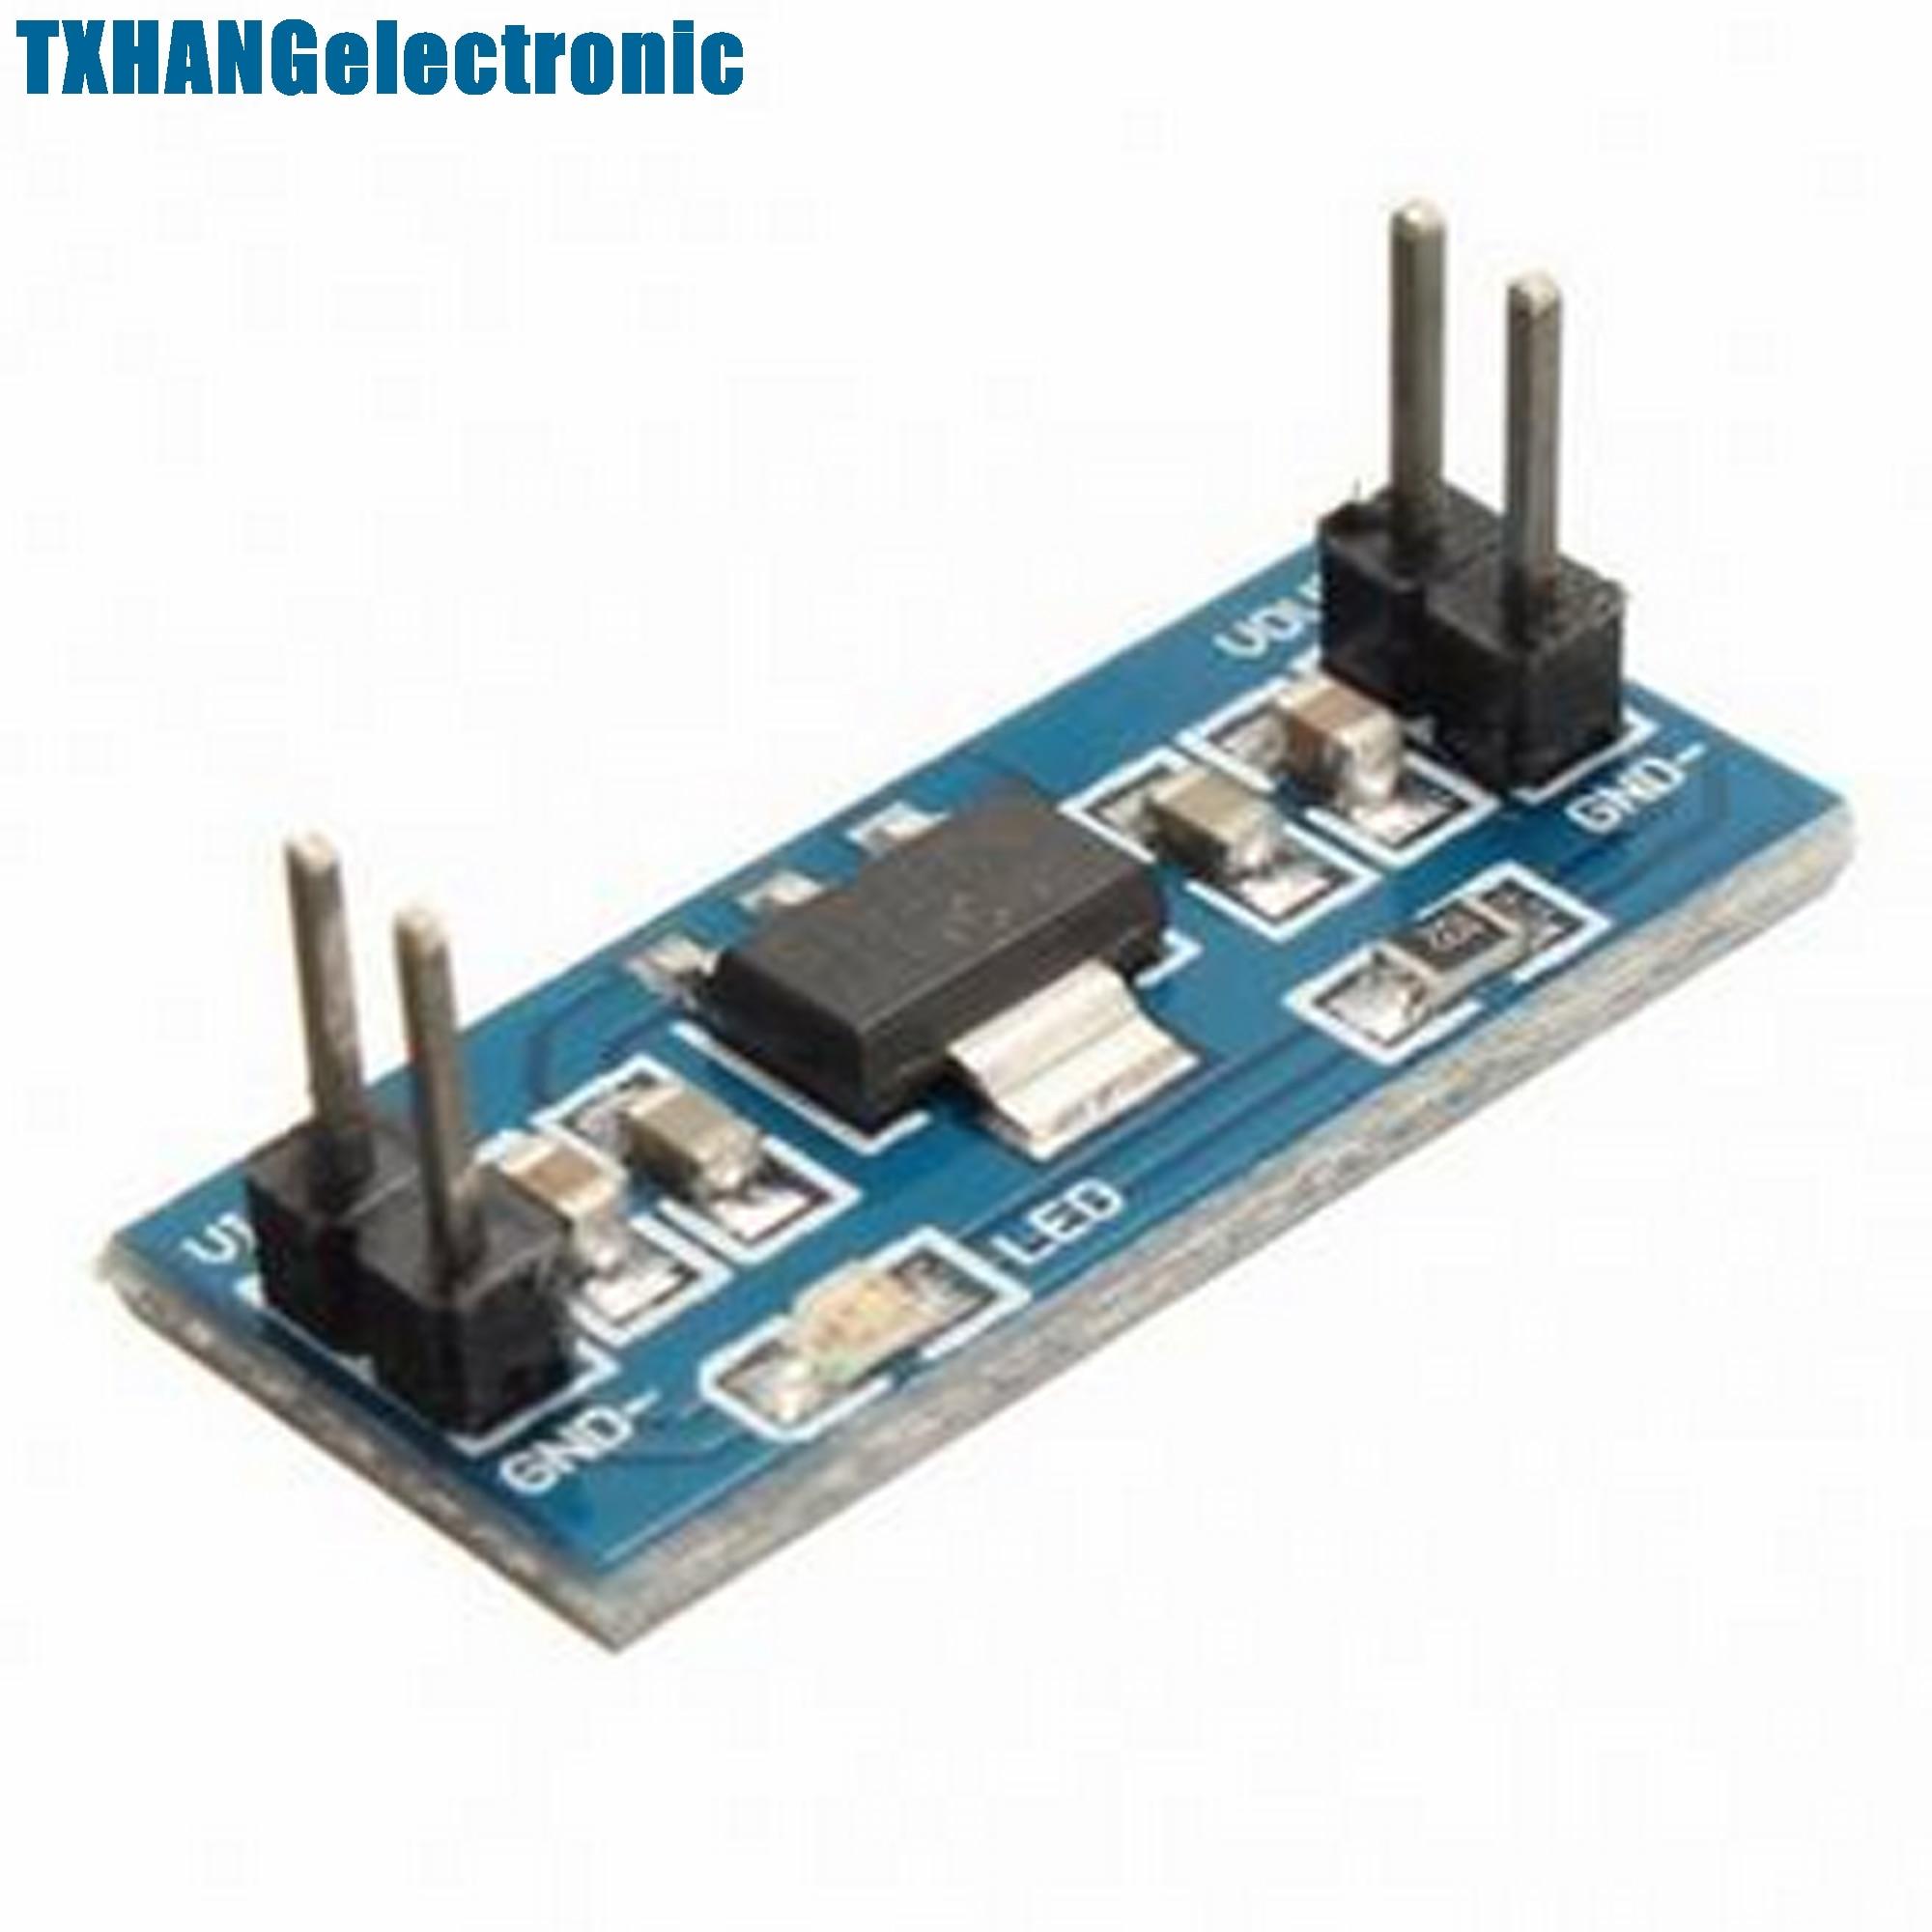 5PCS 6.0V-12V to 5V AMS1117-5.0V Power Supply Module AMS1117-5.0